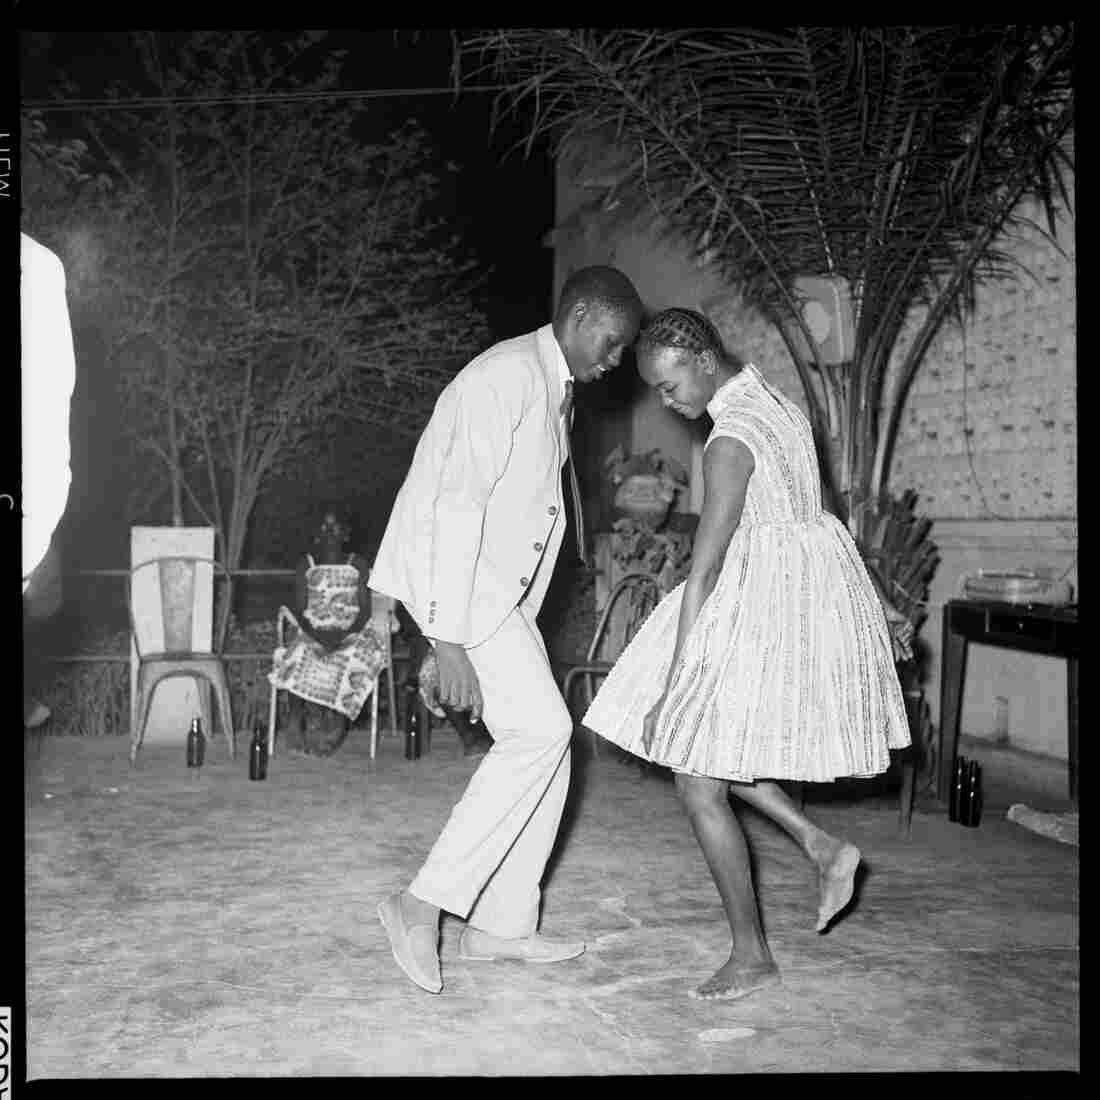 Nui de Noel (Happy Club), 1963 by Malick Sidibe